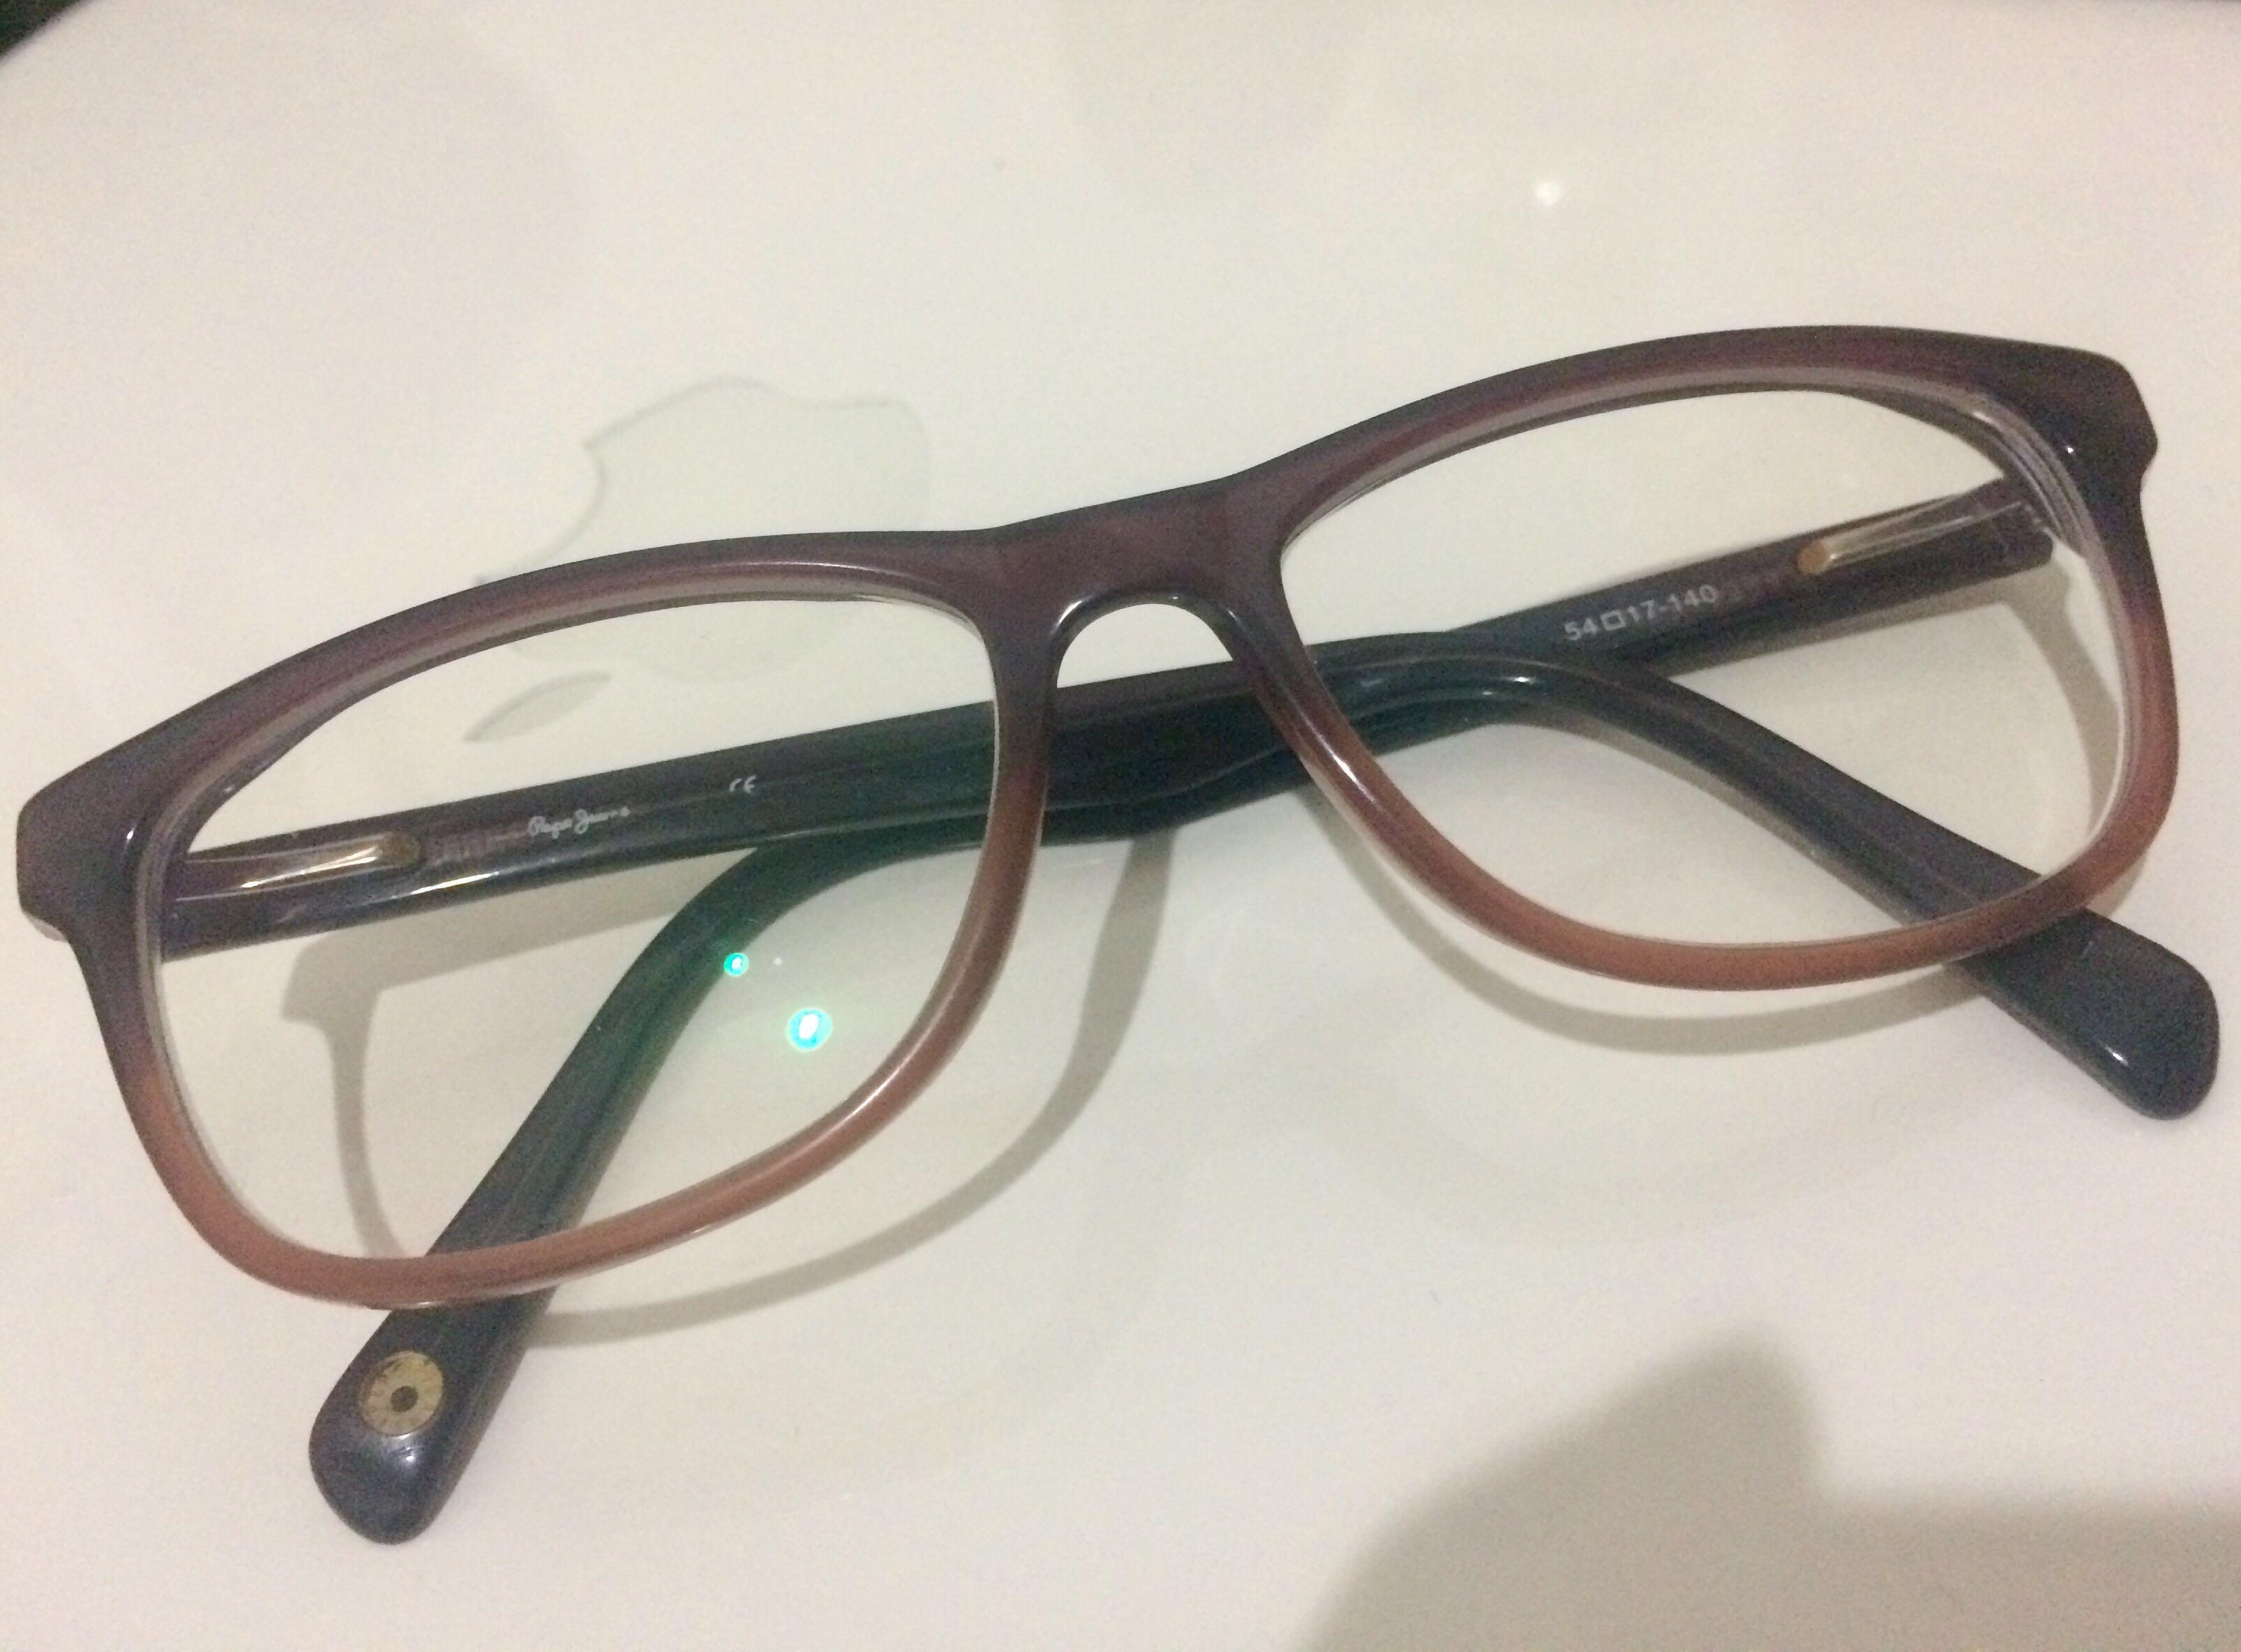 ORIGINAL Pepe Jeans two toned glasses